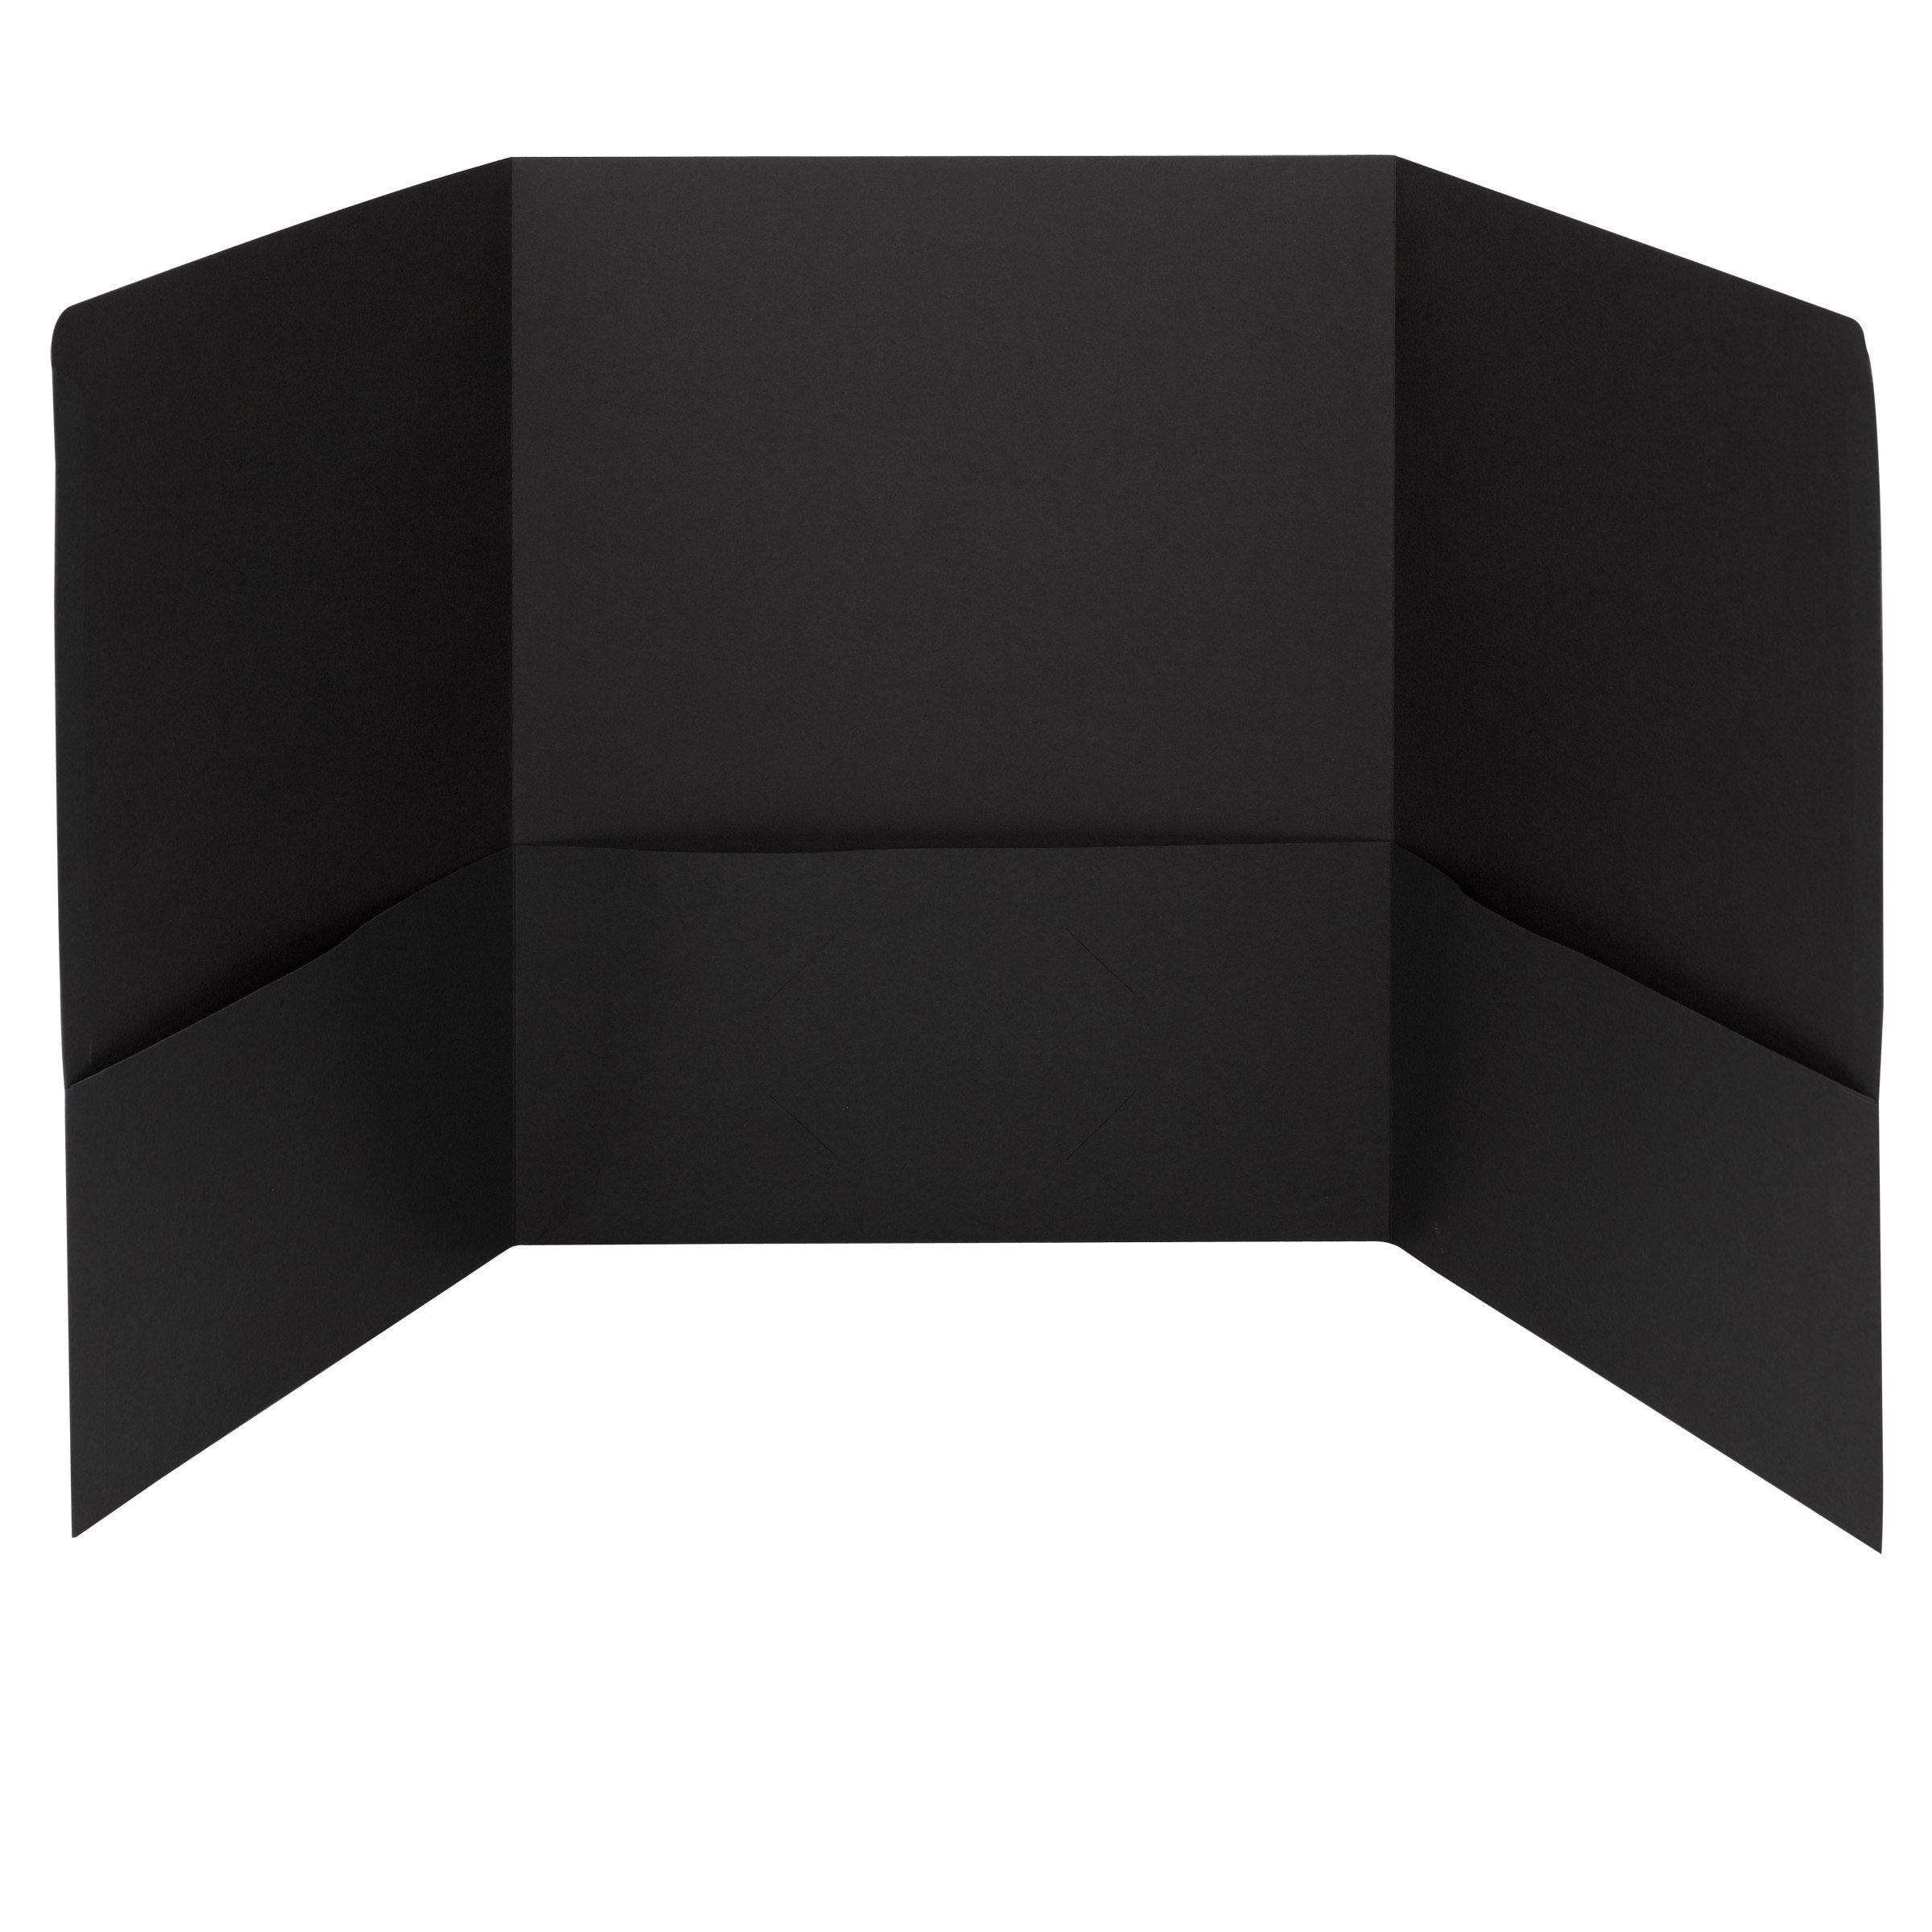 Smead Tri-Fold Pocket Folders, Holds up to 150 Sheets, Letter Size, Black, 20 per Box (87812)